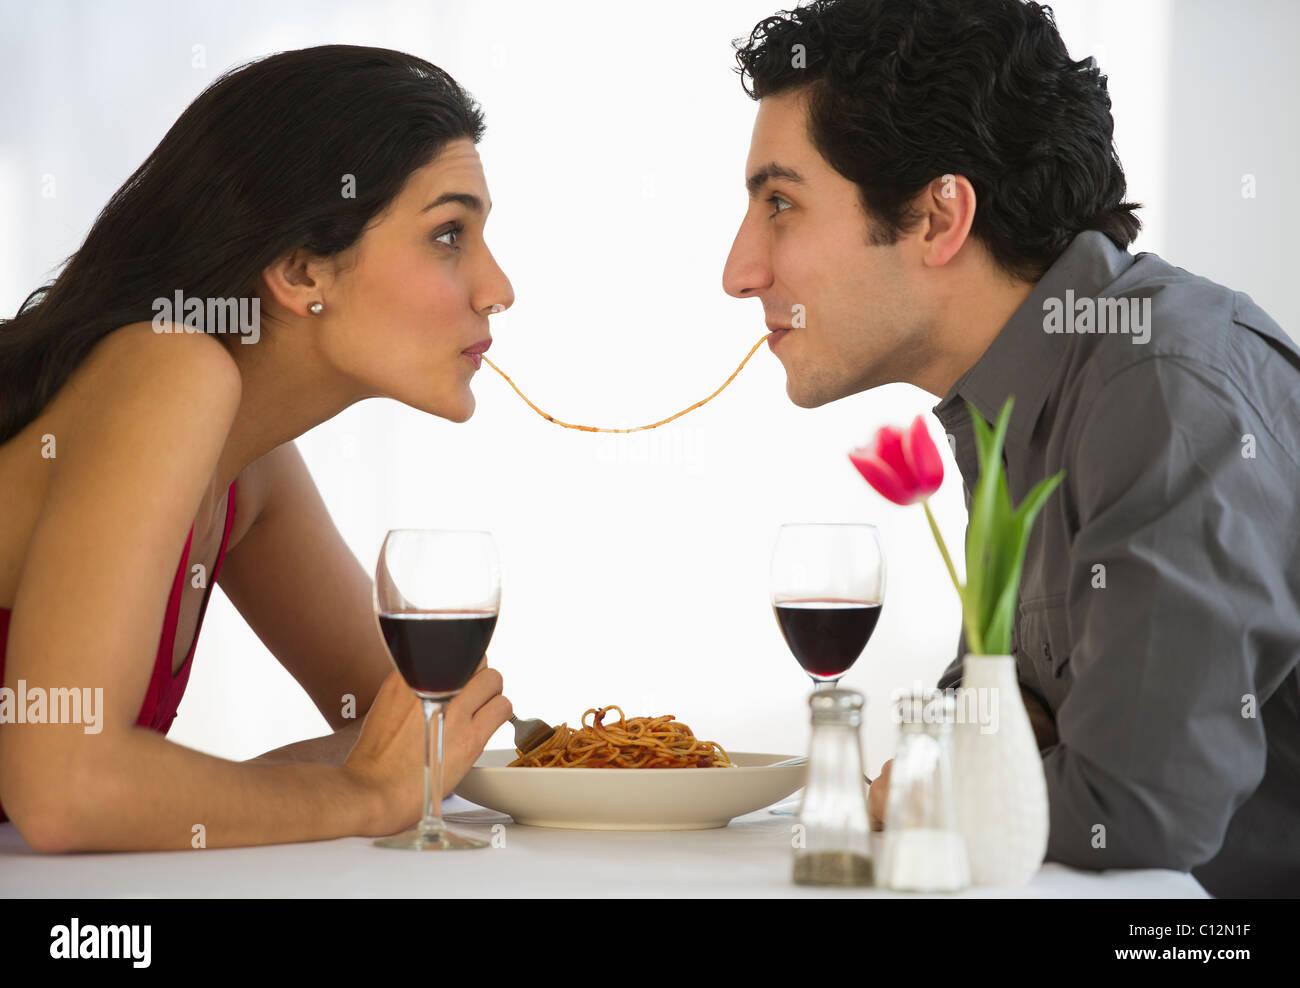 USA, New Jersey, Jersey City, l'heureux couple eating spaghetti ensemble Photo Stock